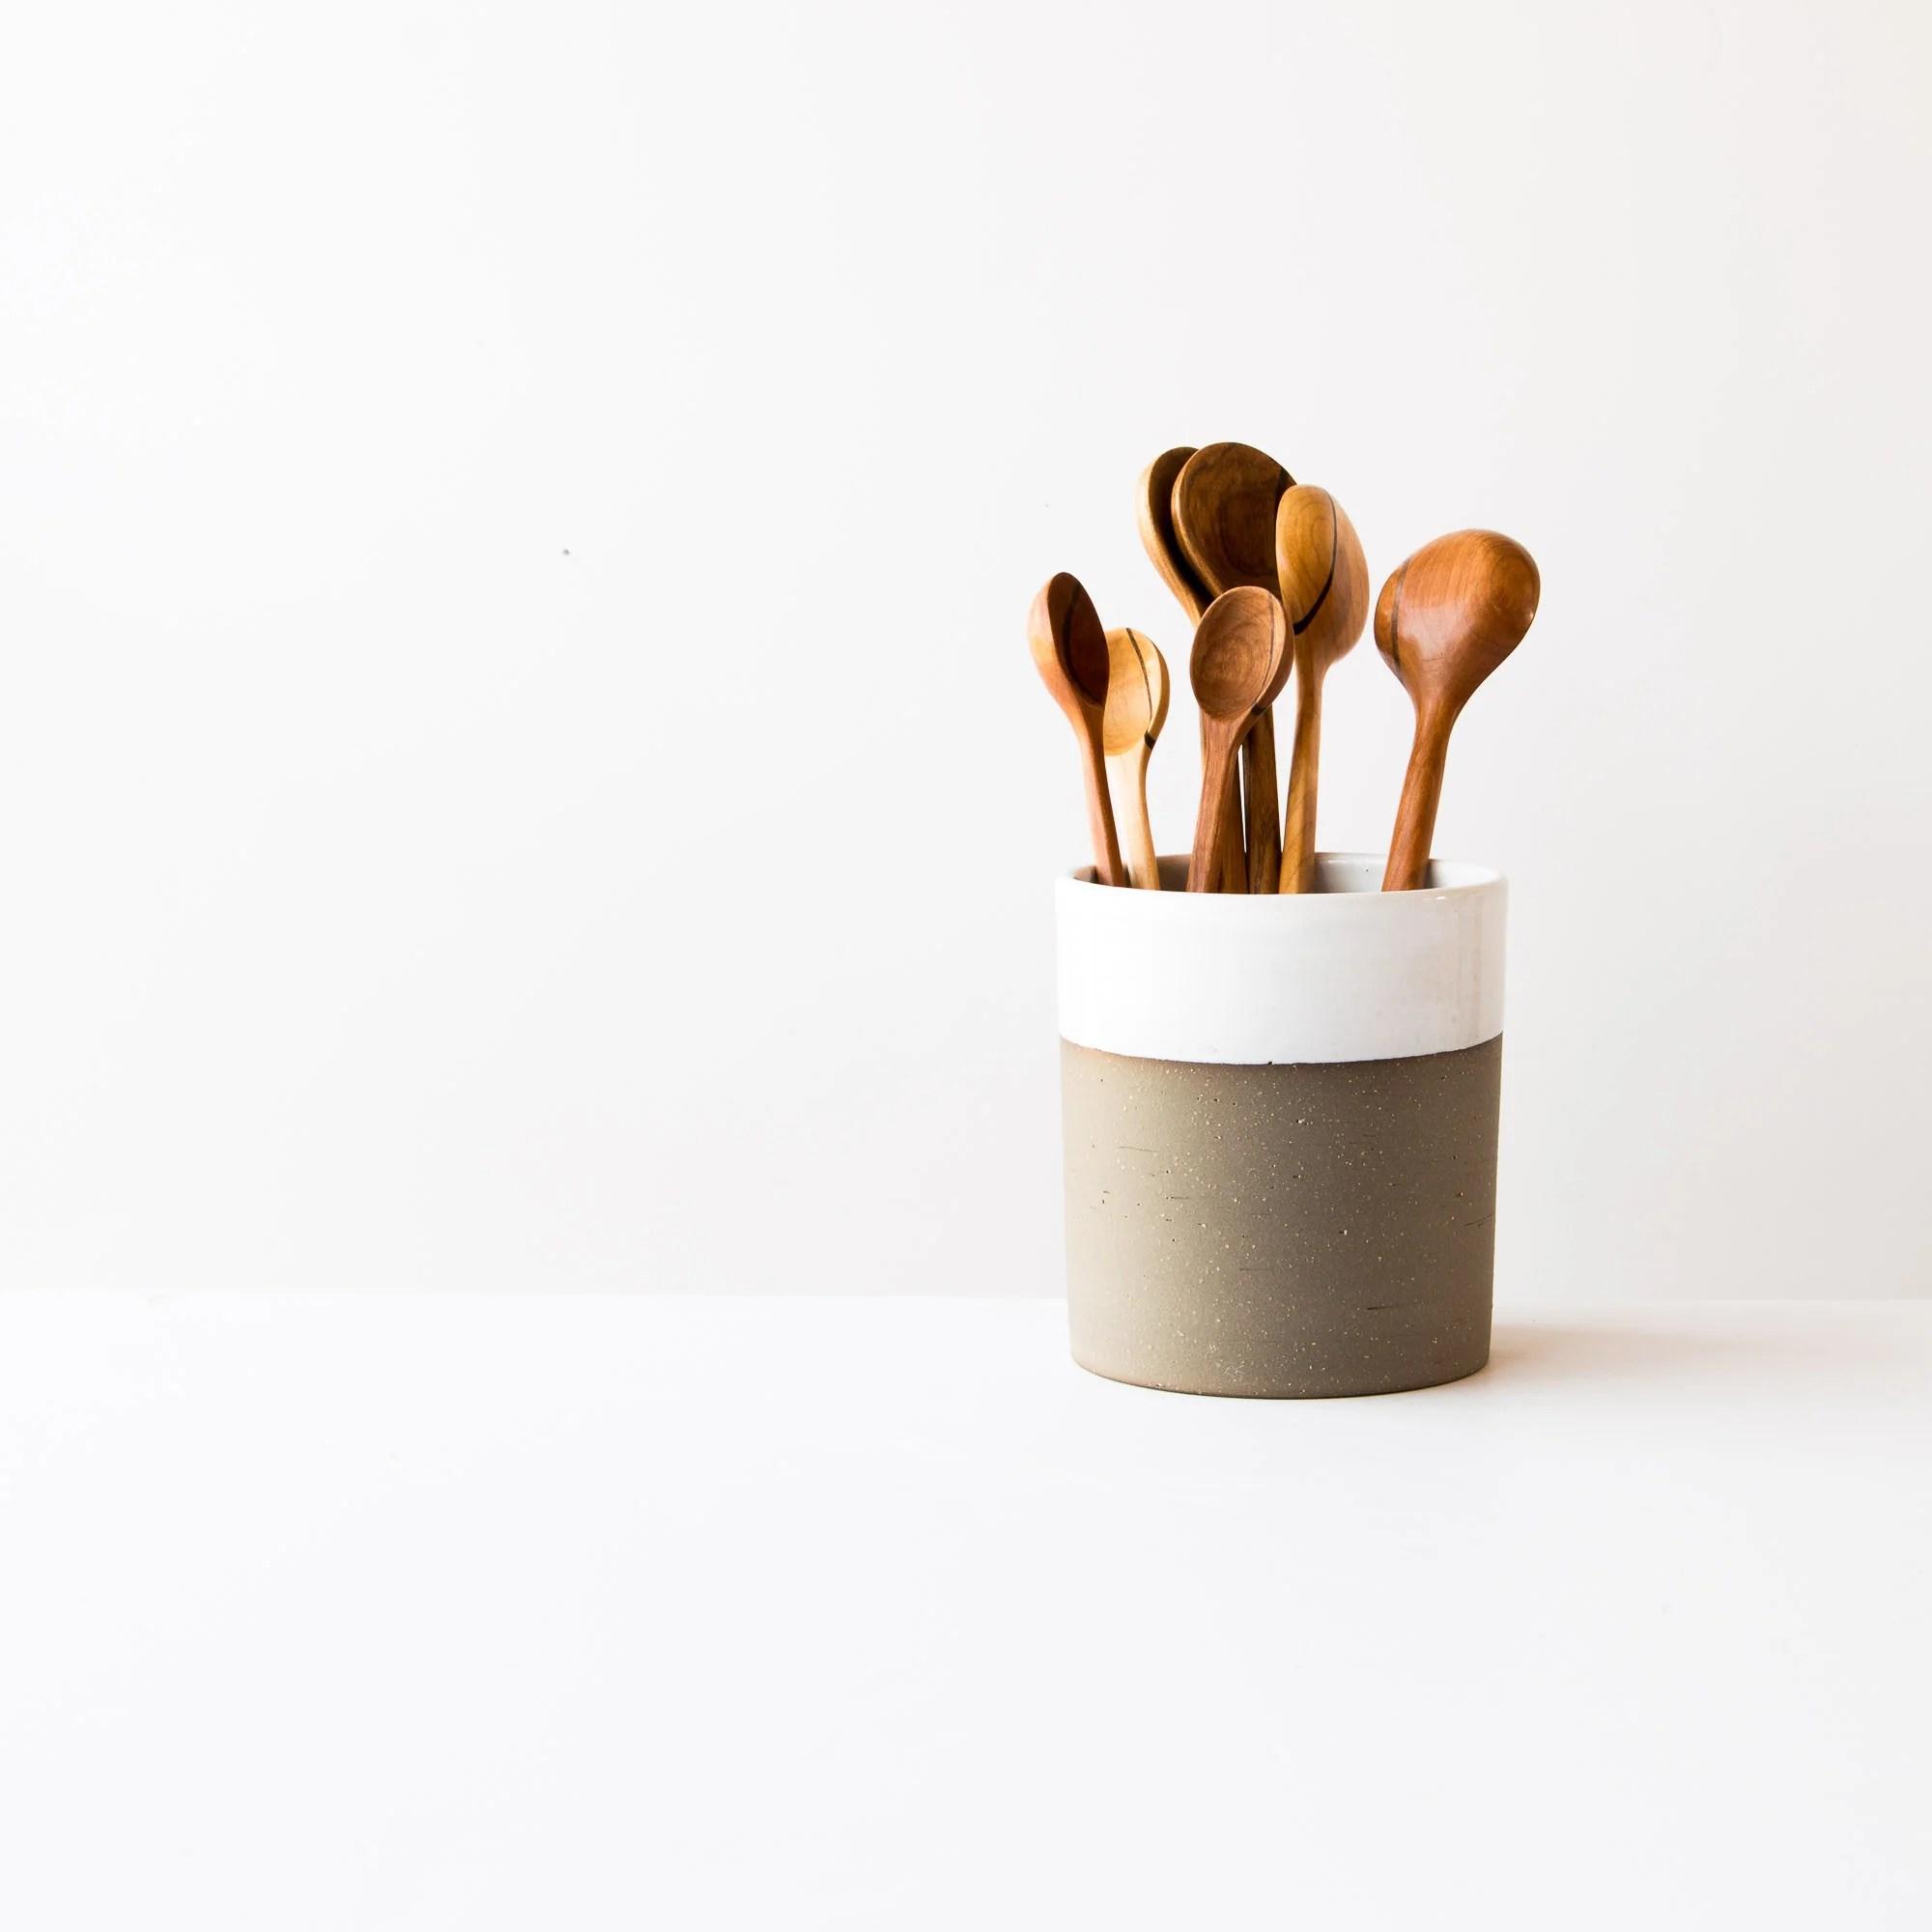 kitchen tool crock remodel kitchens ceramic ustensil ice bucket wine chiller handmade sold online by chic basta